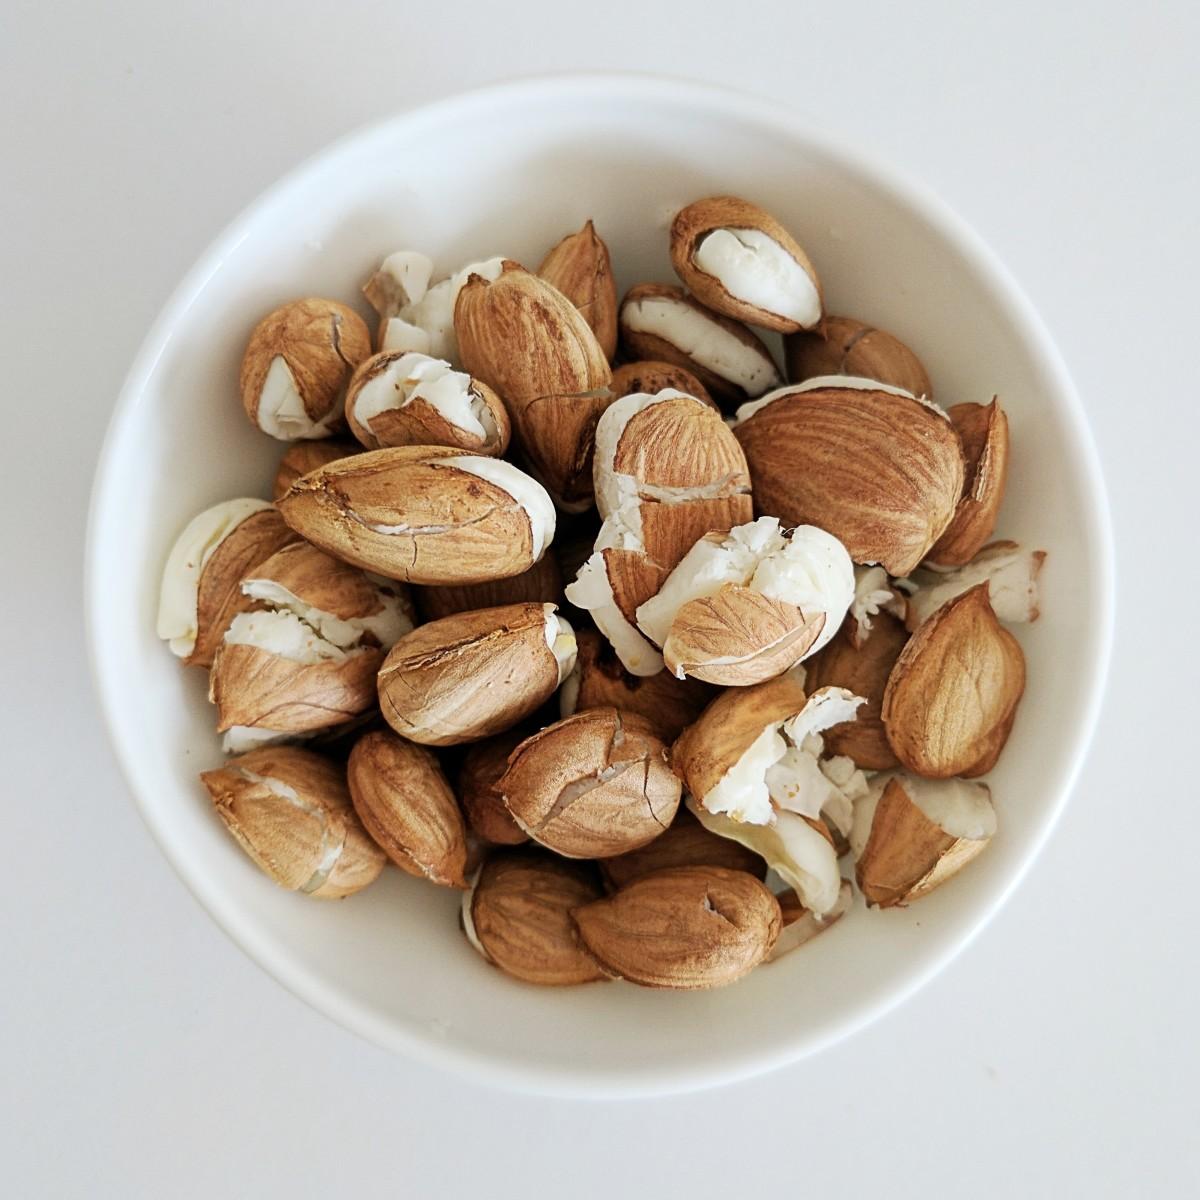 Apricot kernels or seeds